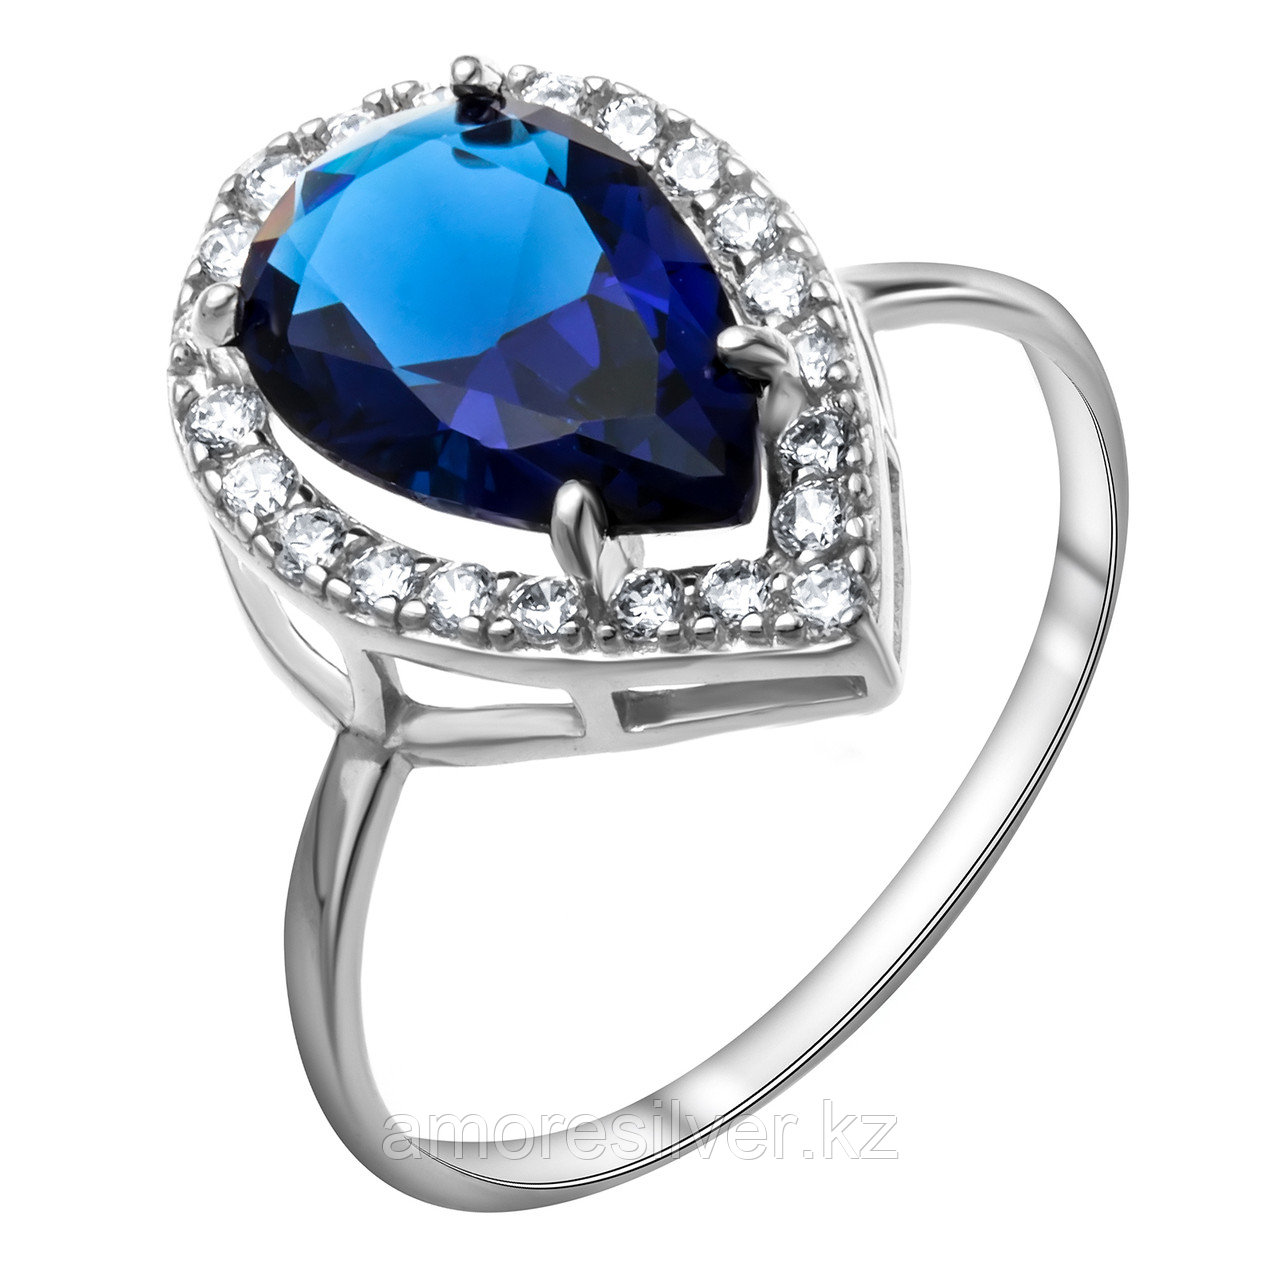 "Кольцо Pokrovsky серебро с родием, кварц синт., ""halo"" 1100992-03505 размеры - 18,5"